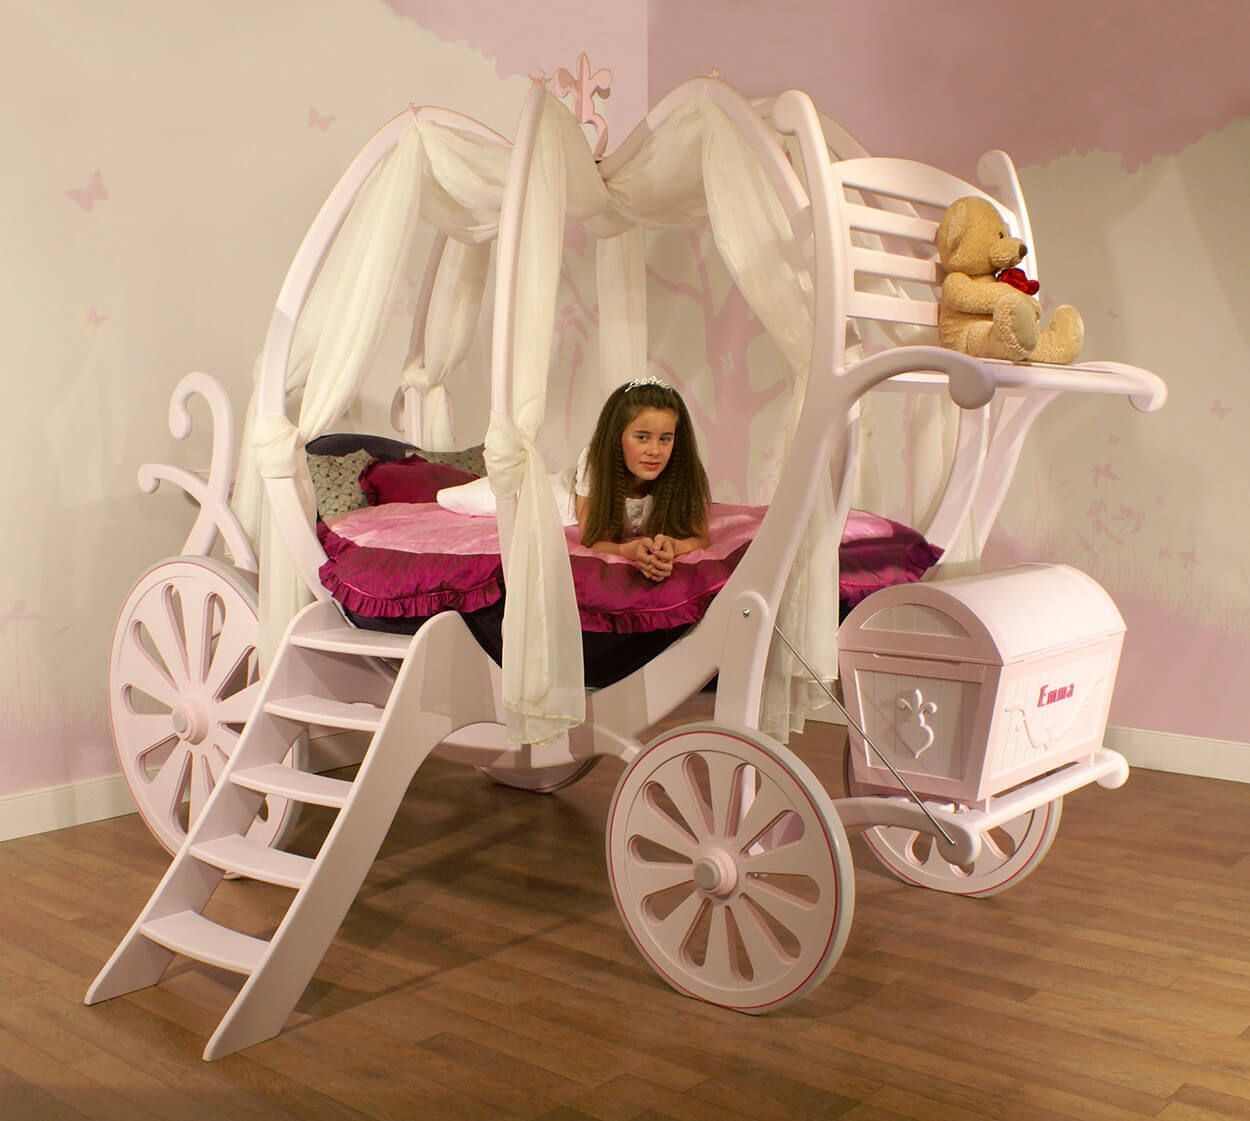 Amazing Girls Bedroom Furniture, Cinderella Carriage Bed, Disney Princess Carriage,  Princess Room, Kid Bedrooms, Girl Rooms, Kid Rooms, Girl Room, Bedroom Kids